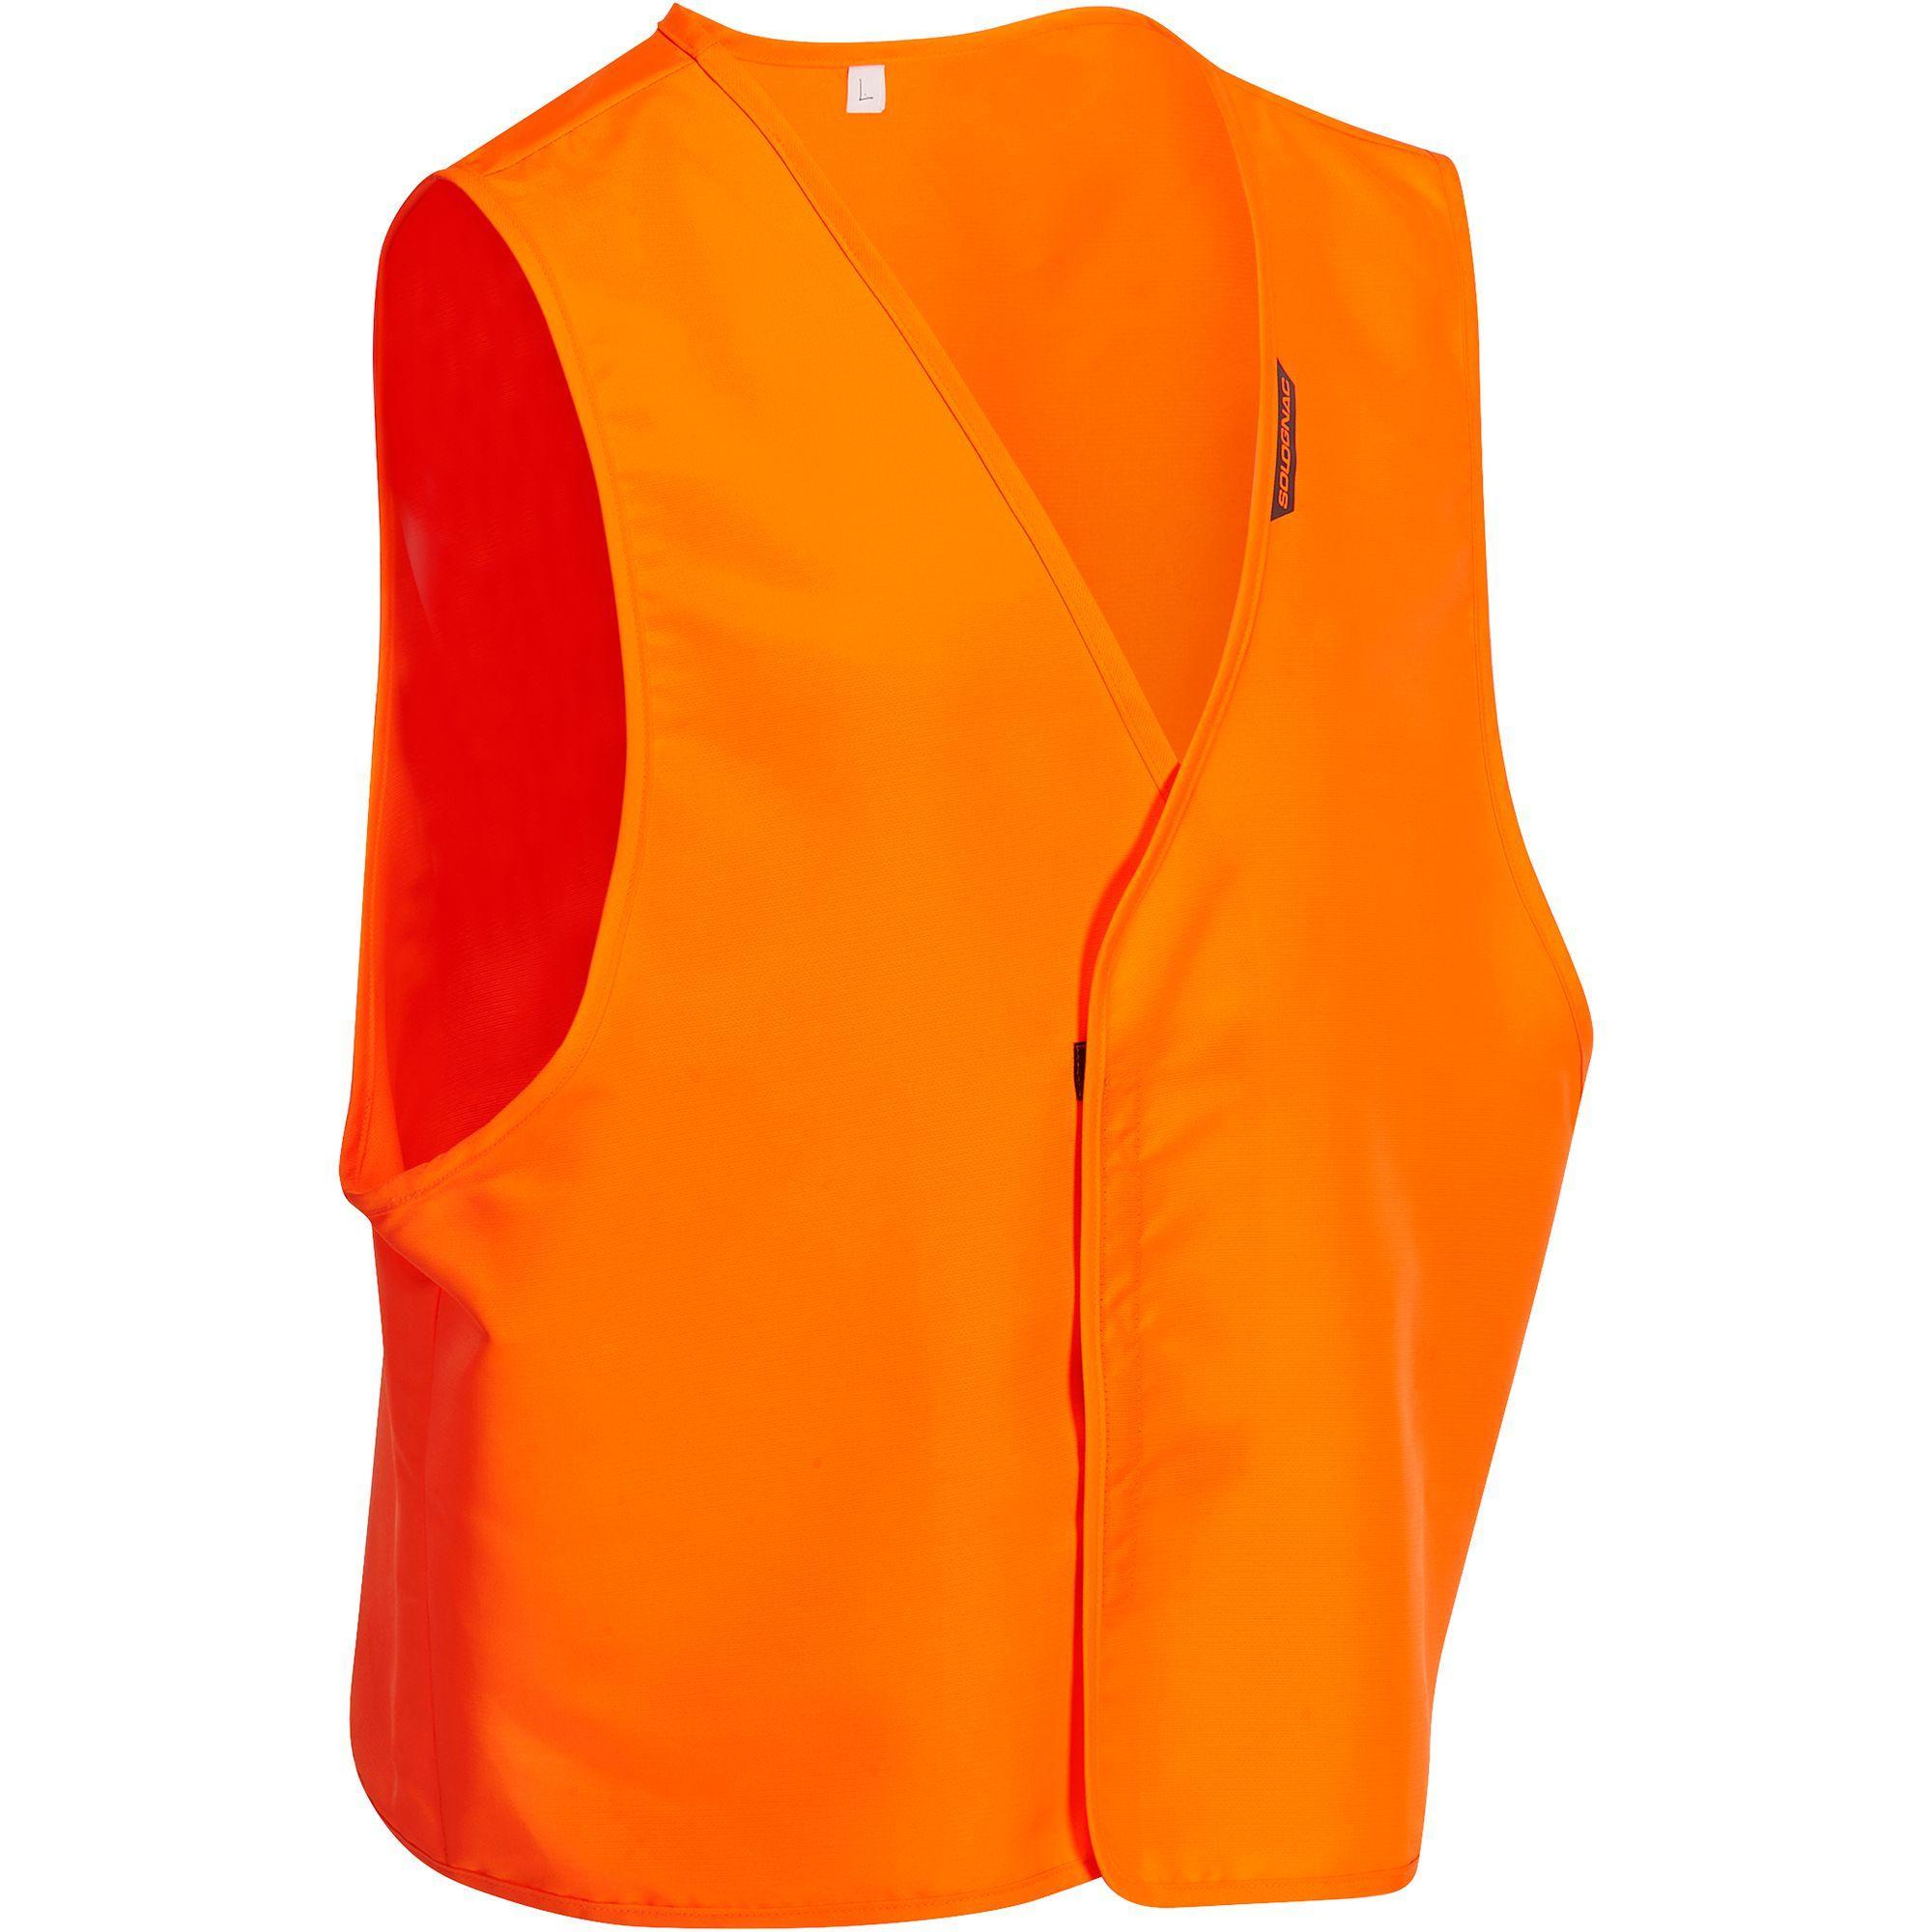 Jagdweste Signalfarbe PSA | Sportbekleidung > Sportwesten > Jagdwesten | Orange | Solognac